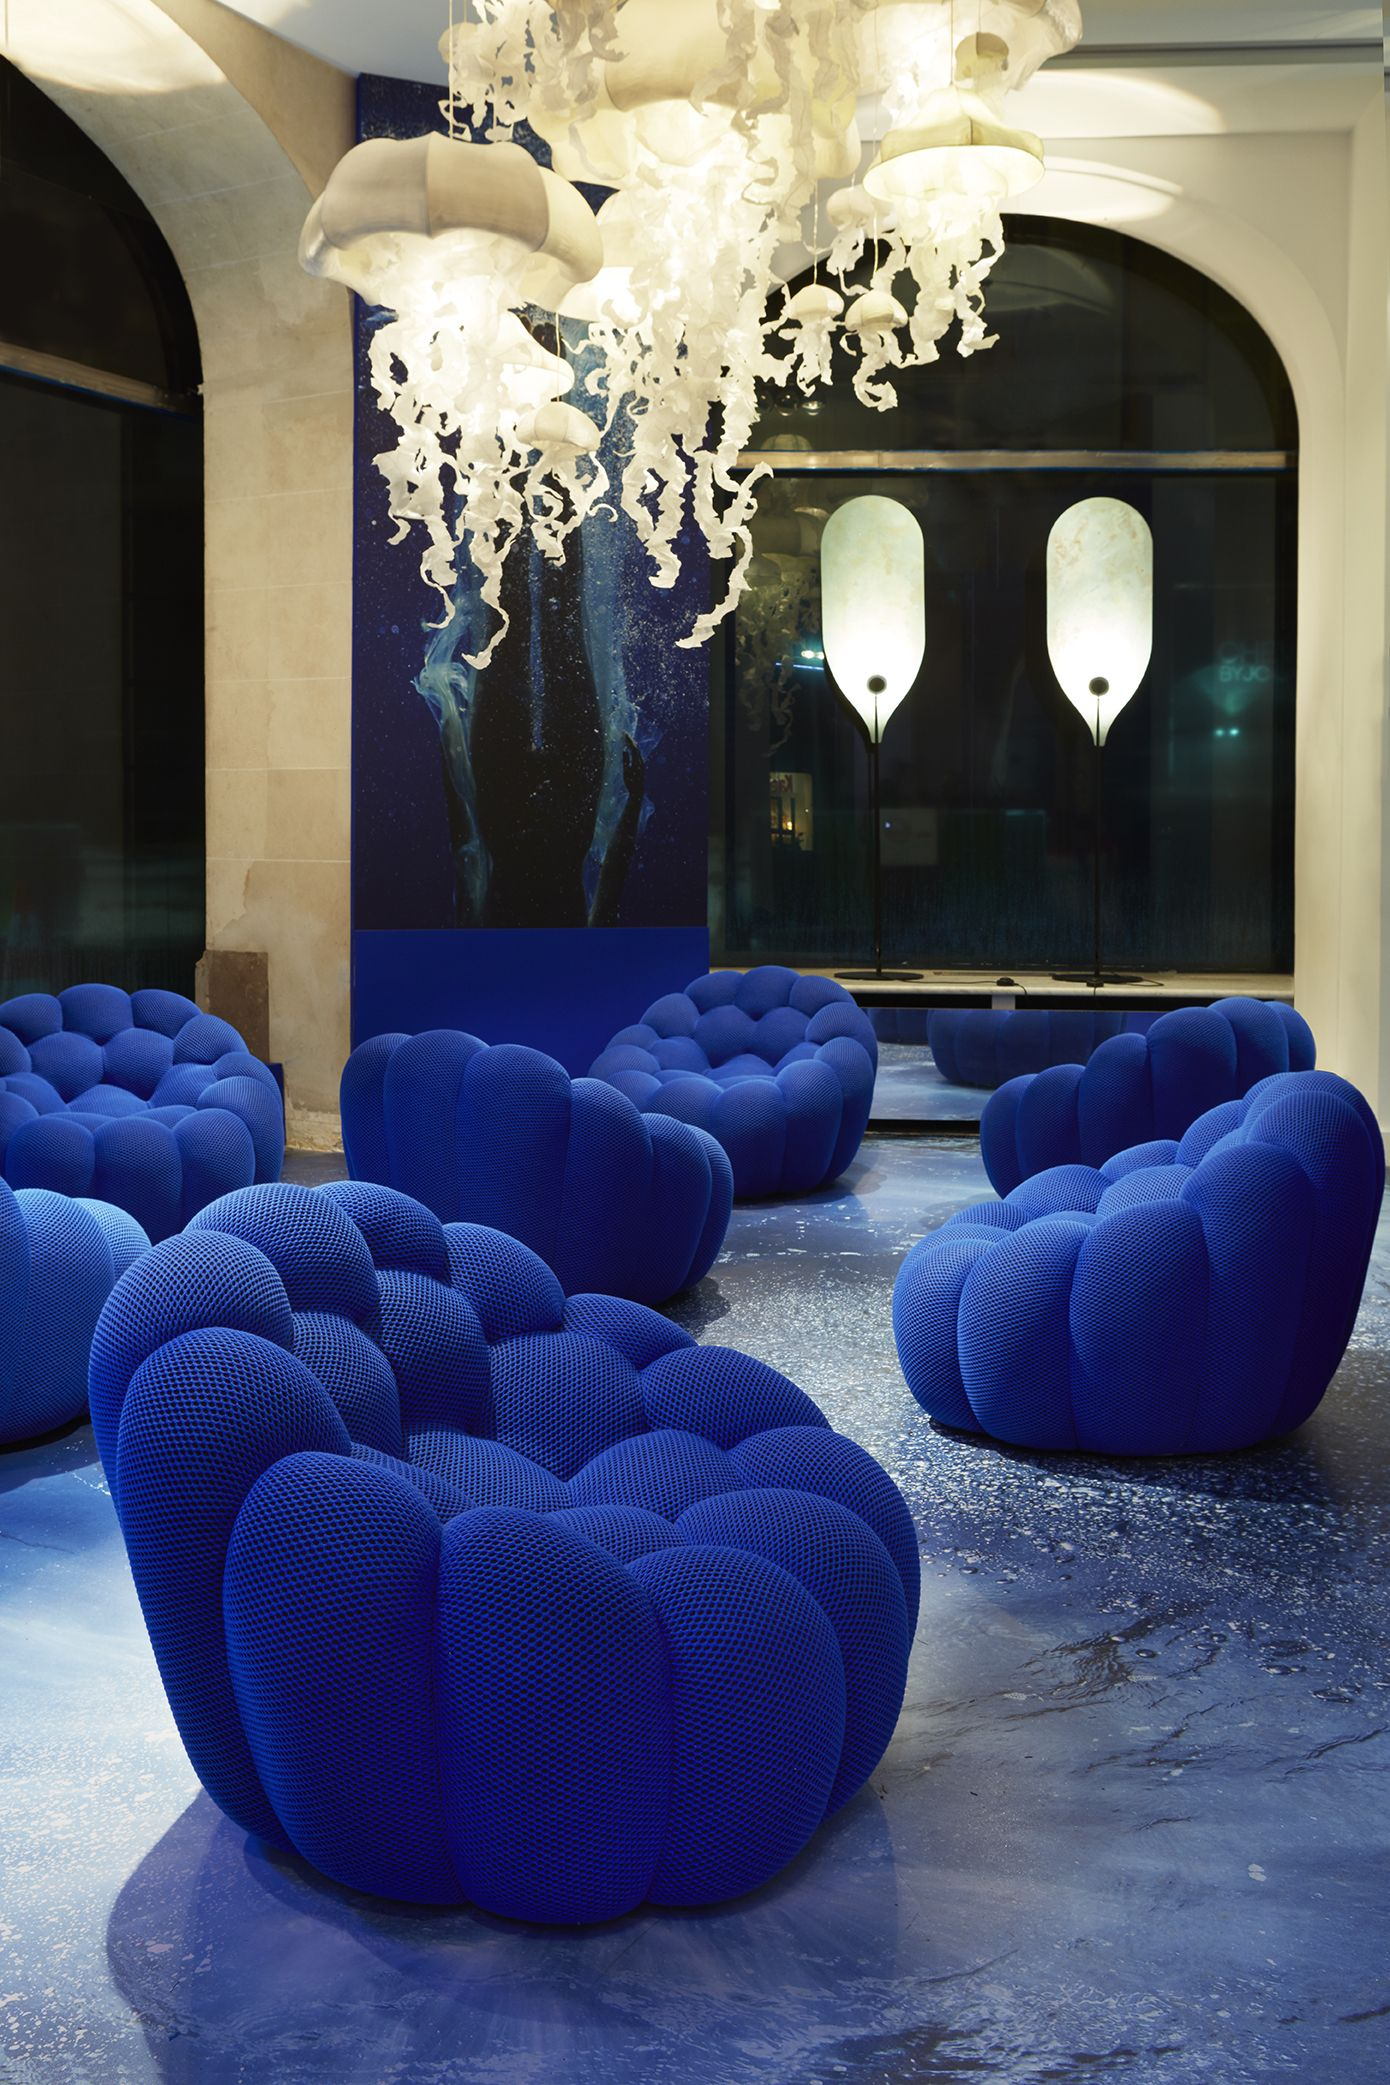 Bubble Sofa Sacha Lakic Folding Sleeper Designed By The Comfort And